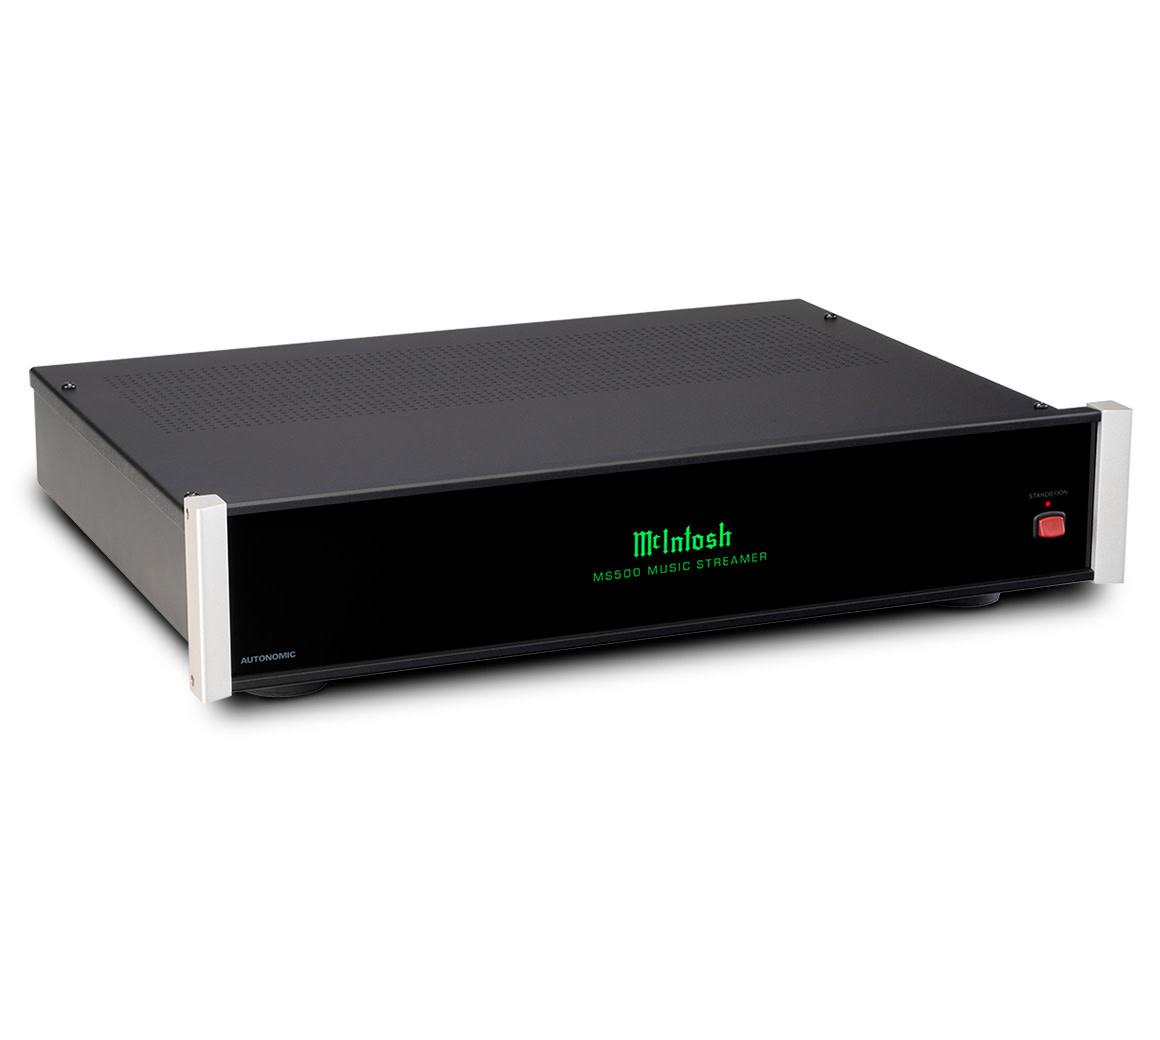 McIntosh MS500 Media Streamer